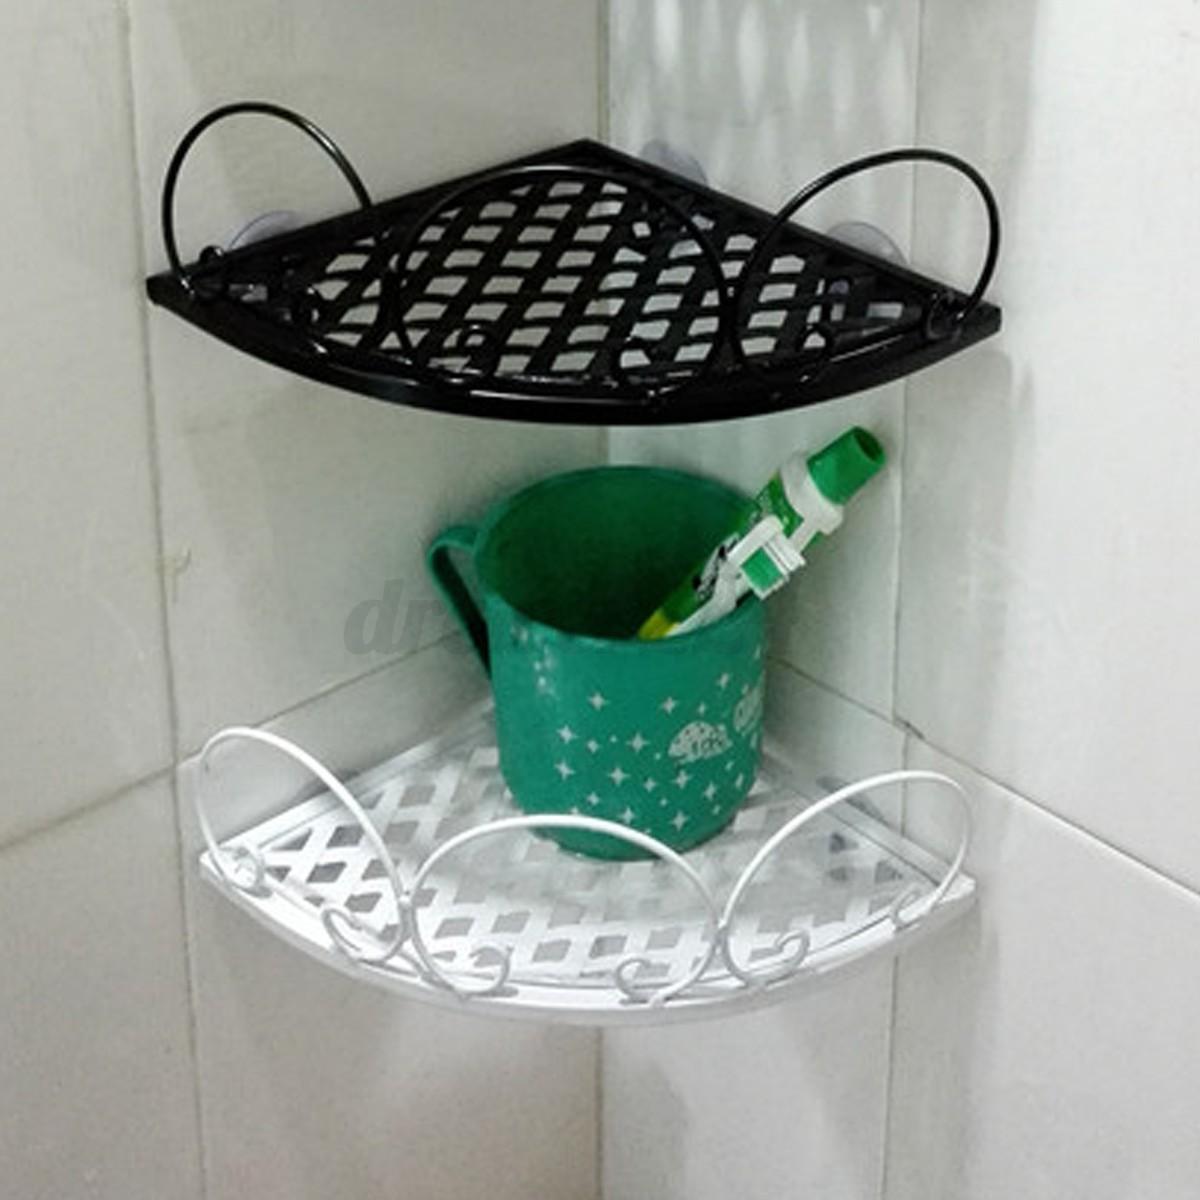 Bathroom shower corner storage rack basket hanging wall shelf holder organizer ebay for Hanging baskets for bathroom storage